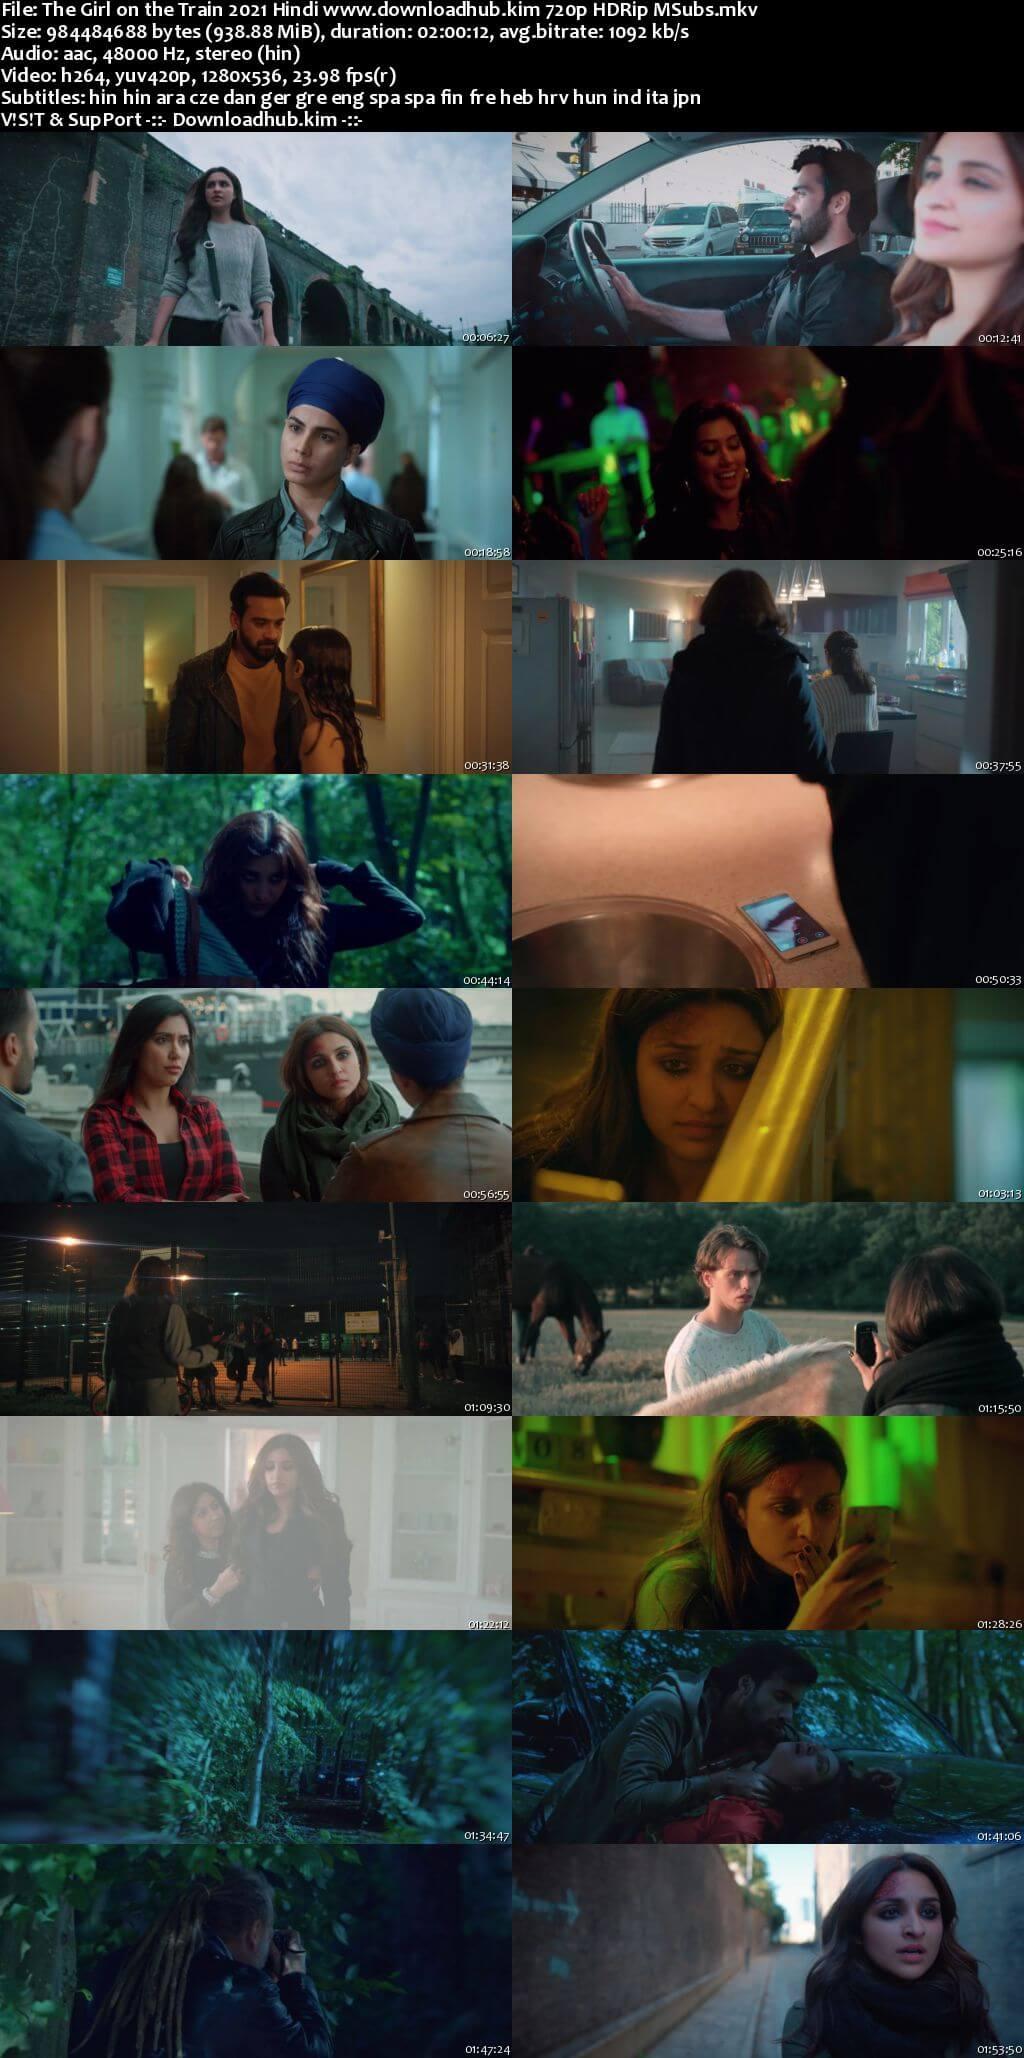 The Girl on the Train 2021 Hindi 720p HDRip MSubs